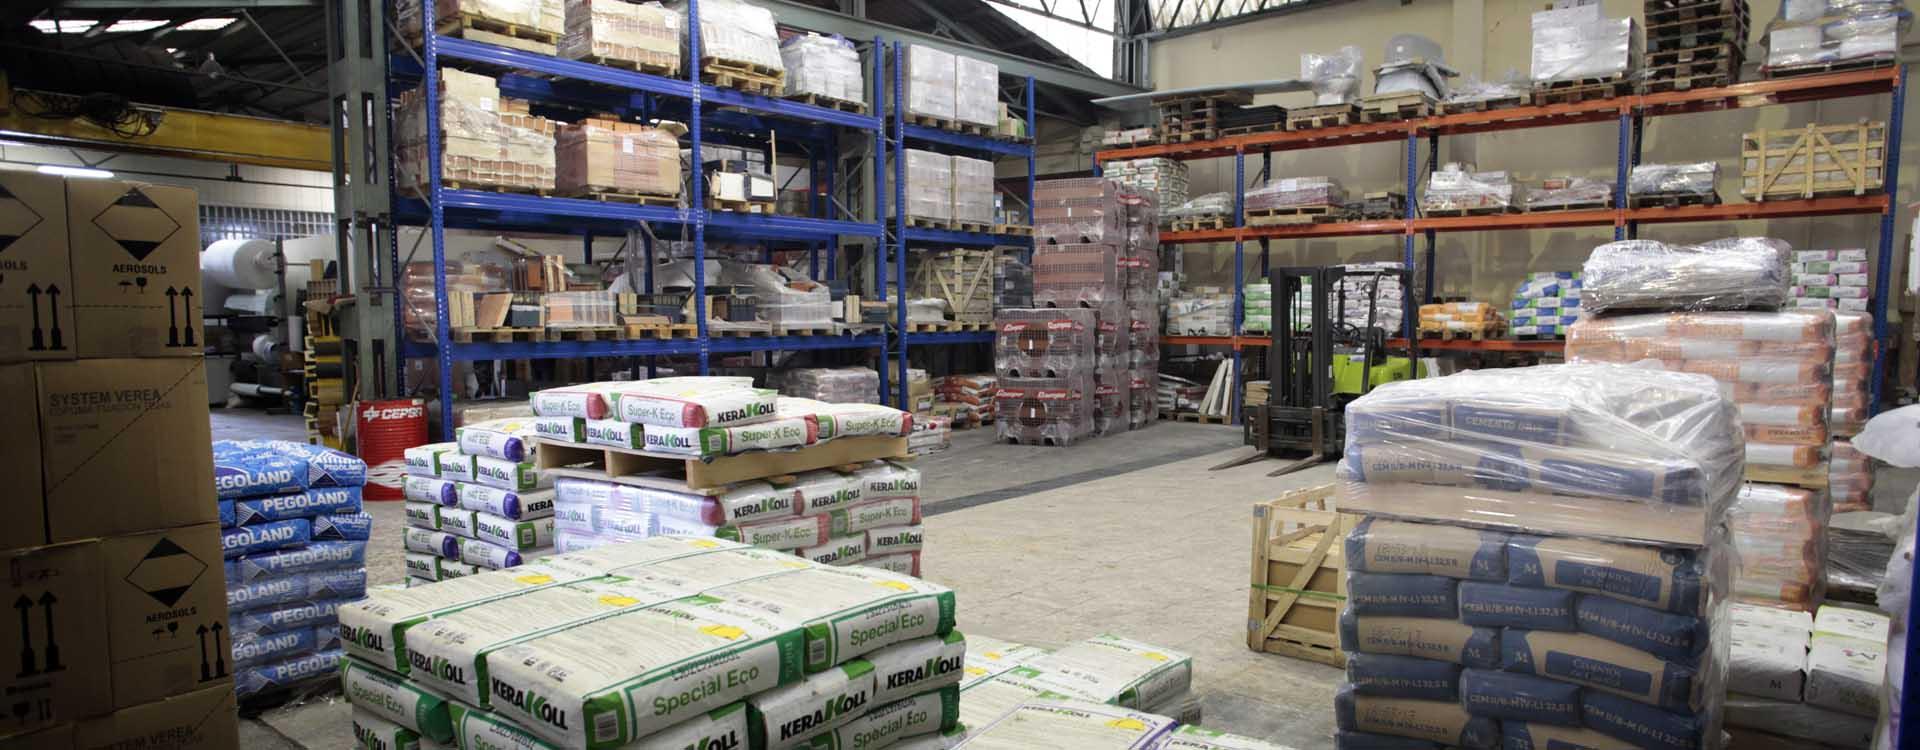 Corplama materiales de construcci n - Casa de materiales de construccion ...